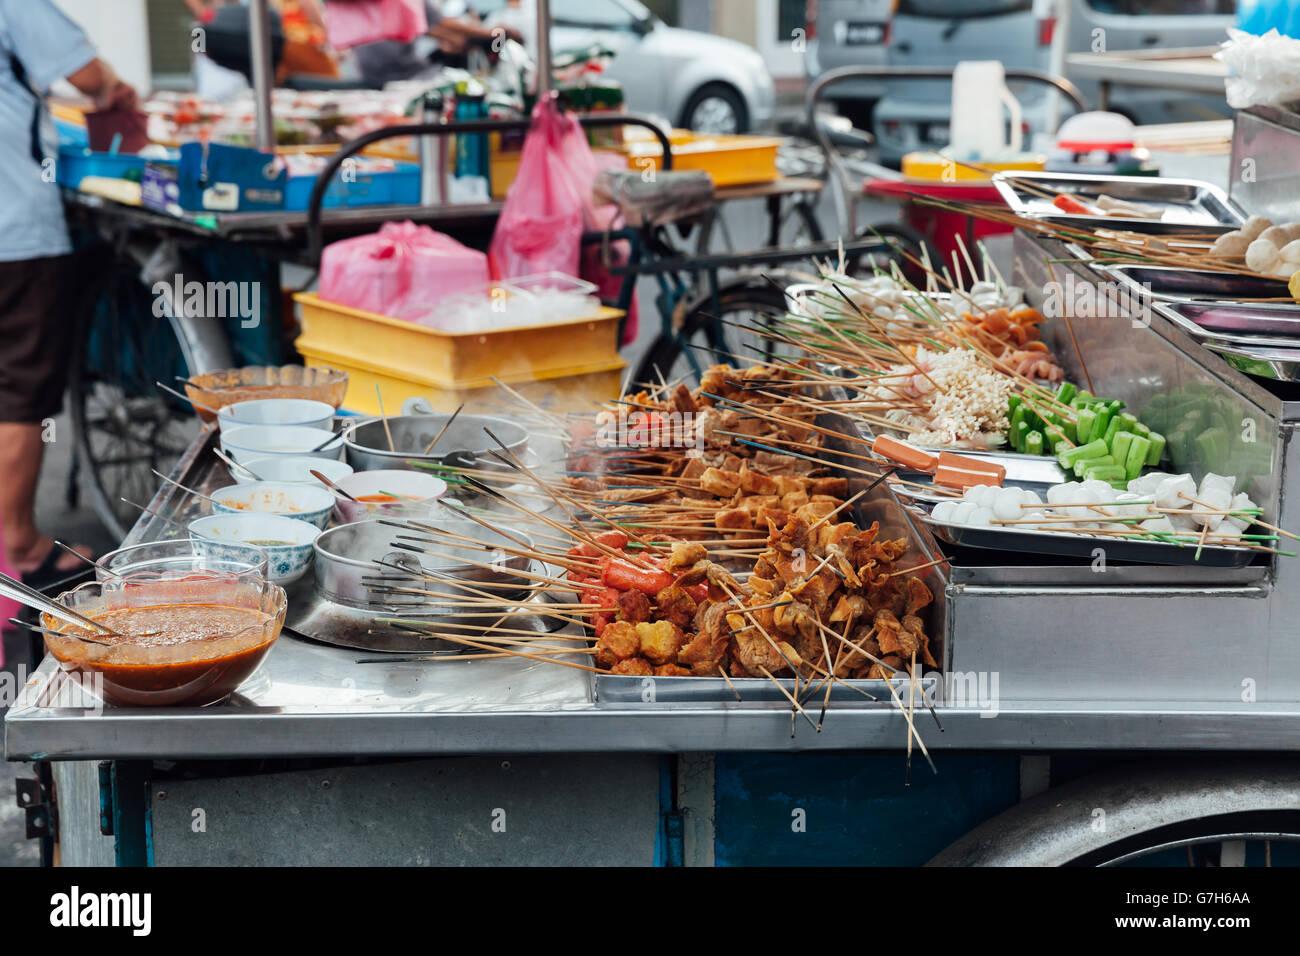 Steamboat Lok-Lok cale en la calle Kimberly mercado alimentario, George Town, en Penang, Malasia. Imagen De Stock